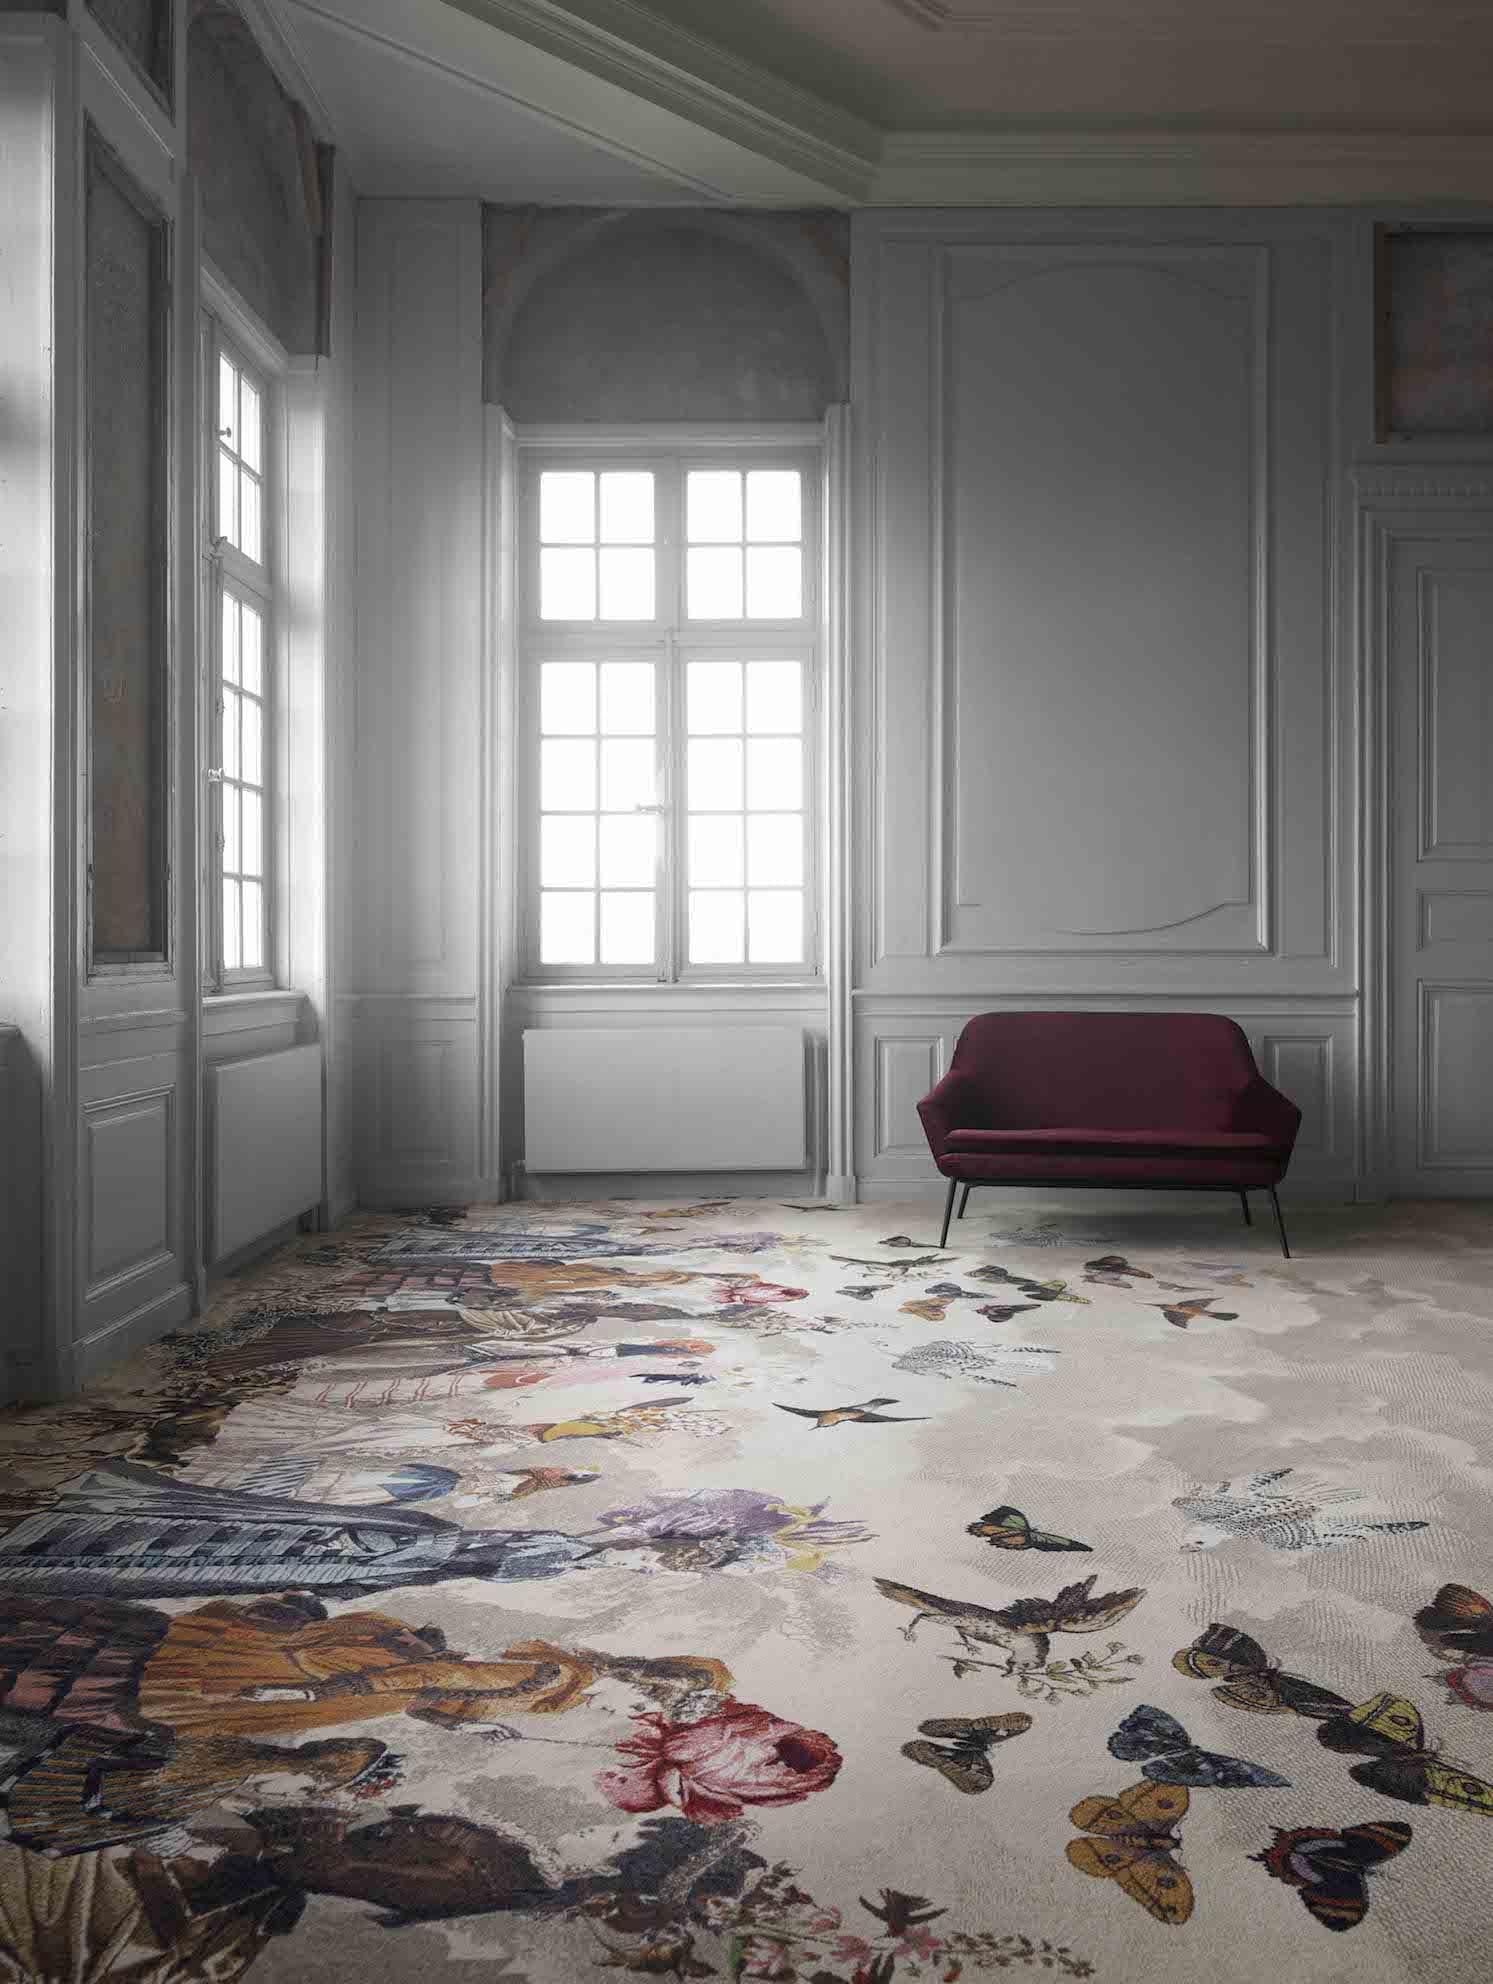 Danish flooring giant launches three new sustainable ranges